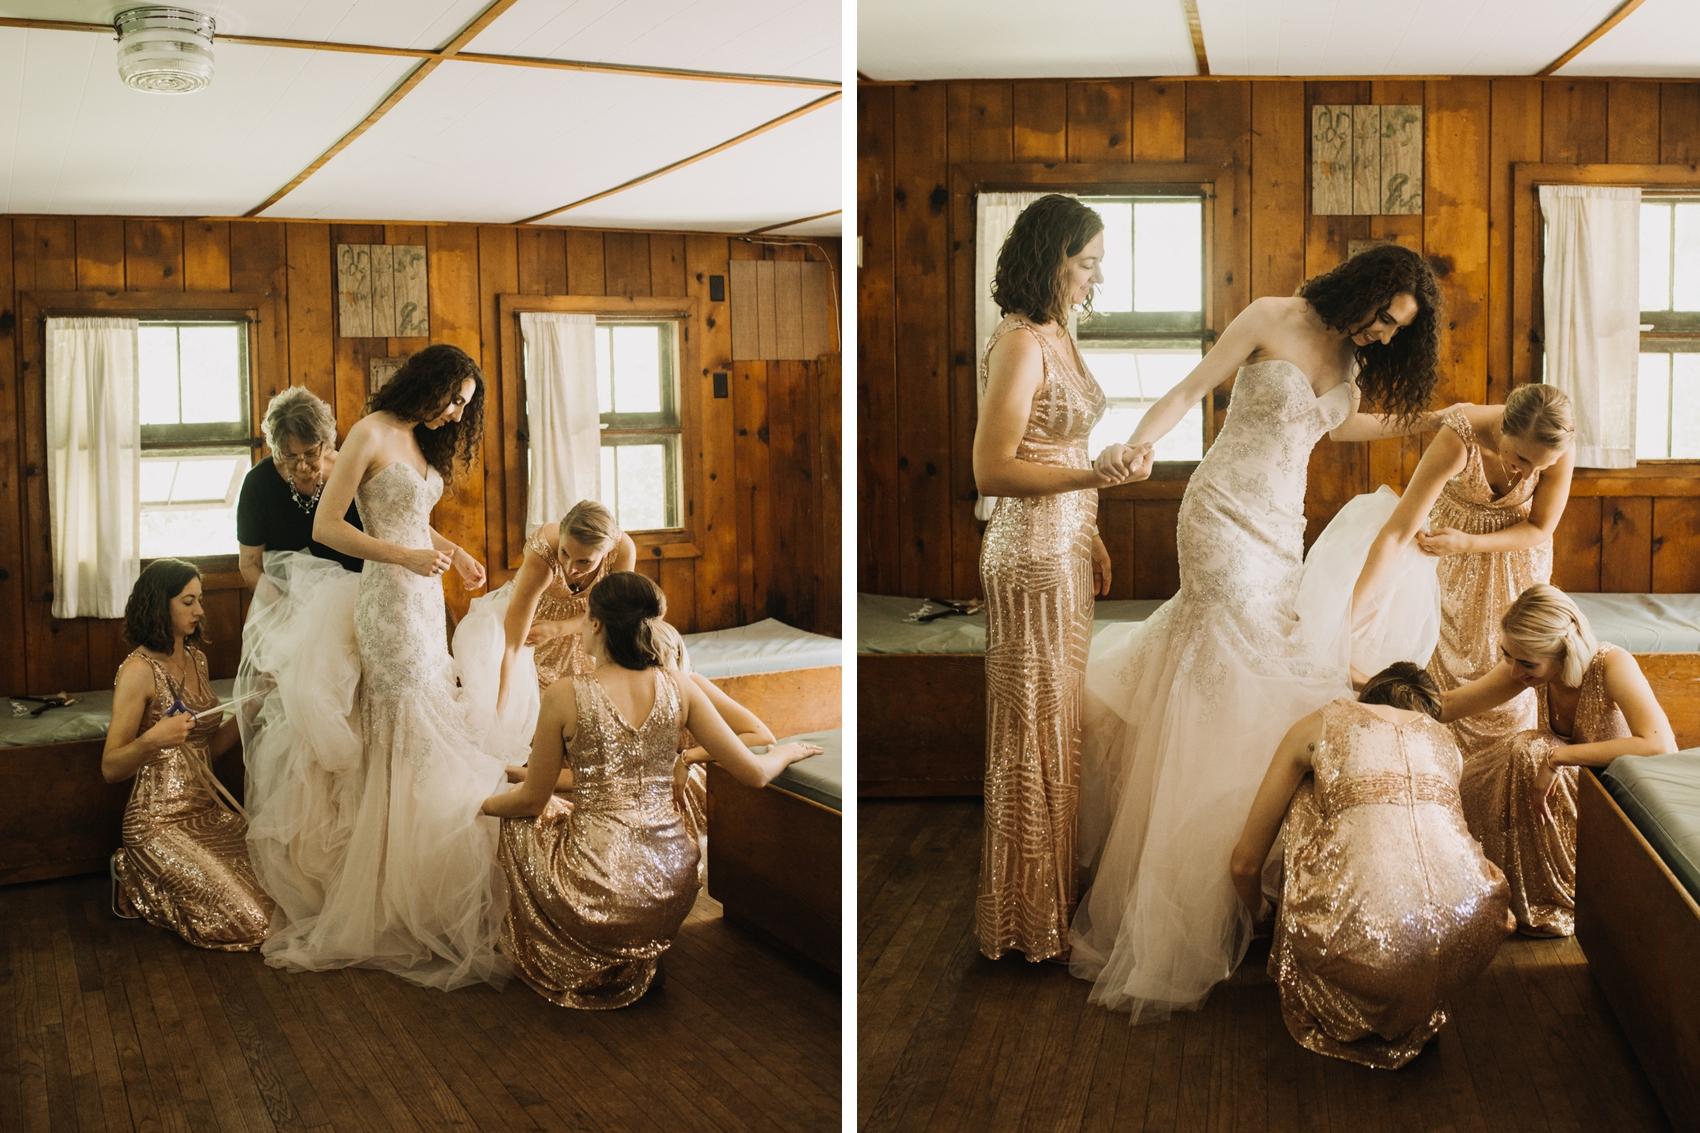 gold-dress-bride-ready.jpg